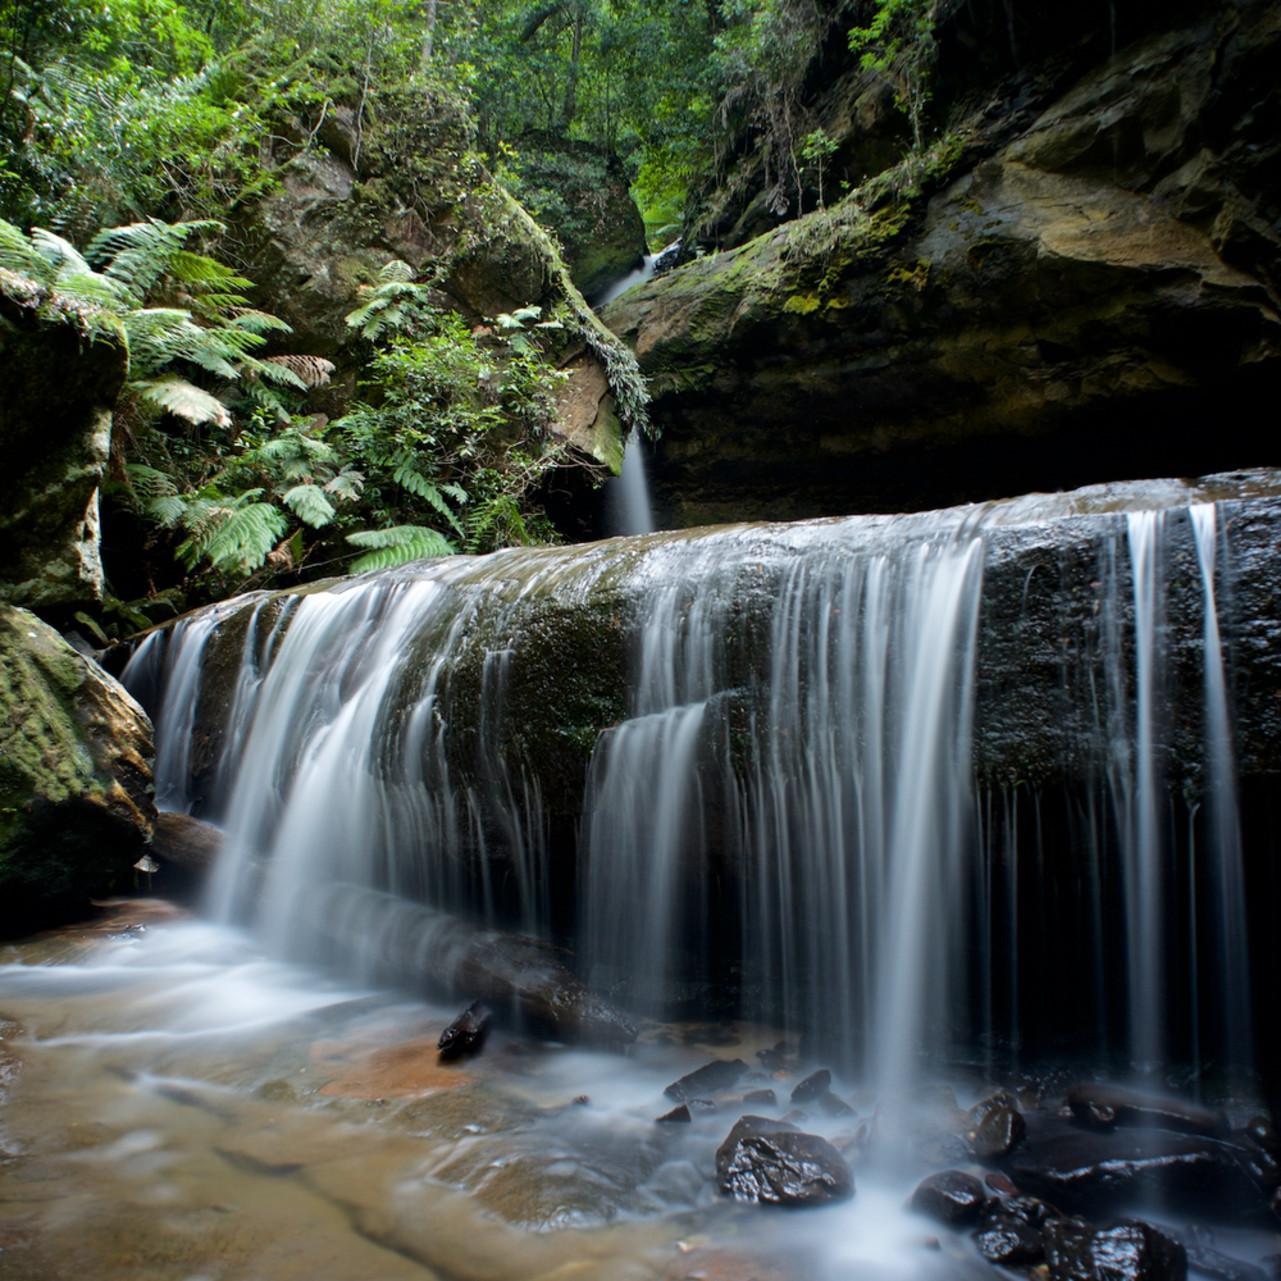 Trinity falls blackheath govetts leap blue mountains national park nsw australia limited edition wj0exs